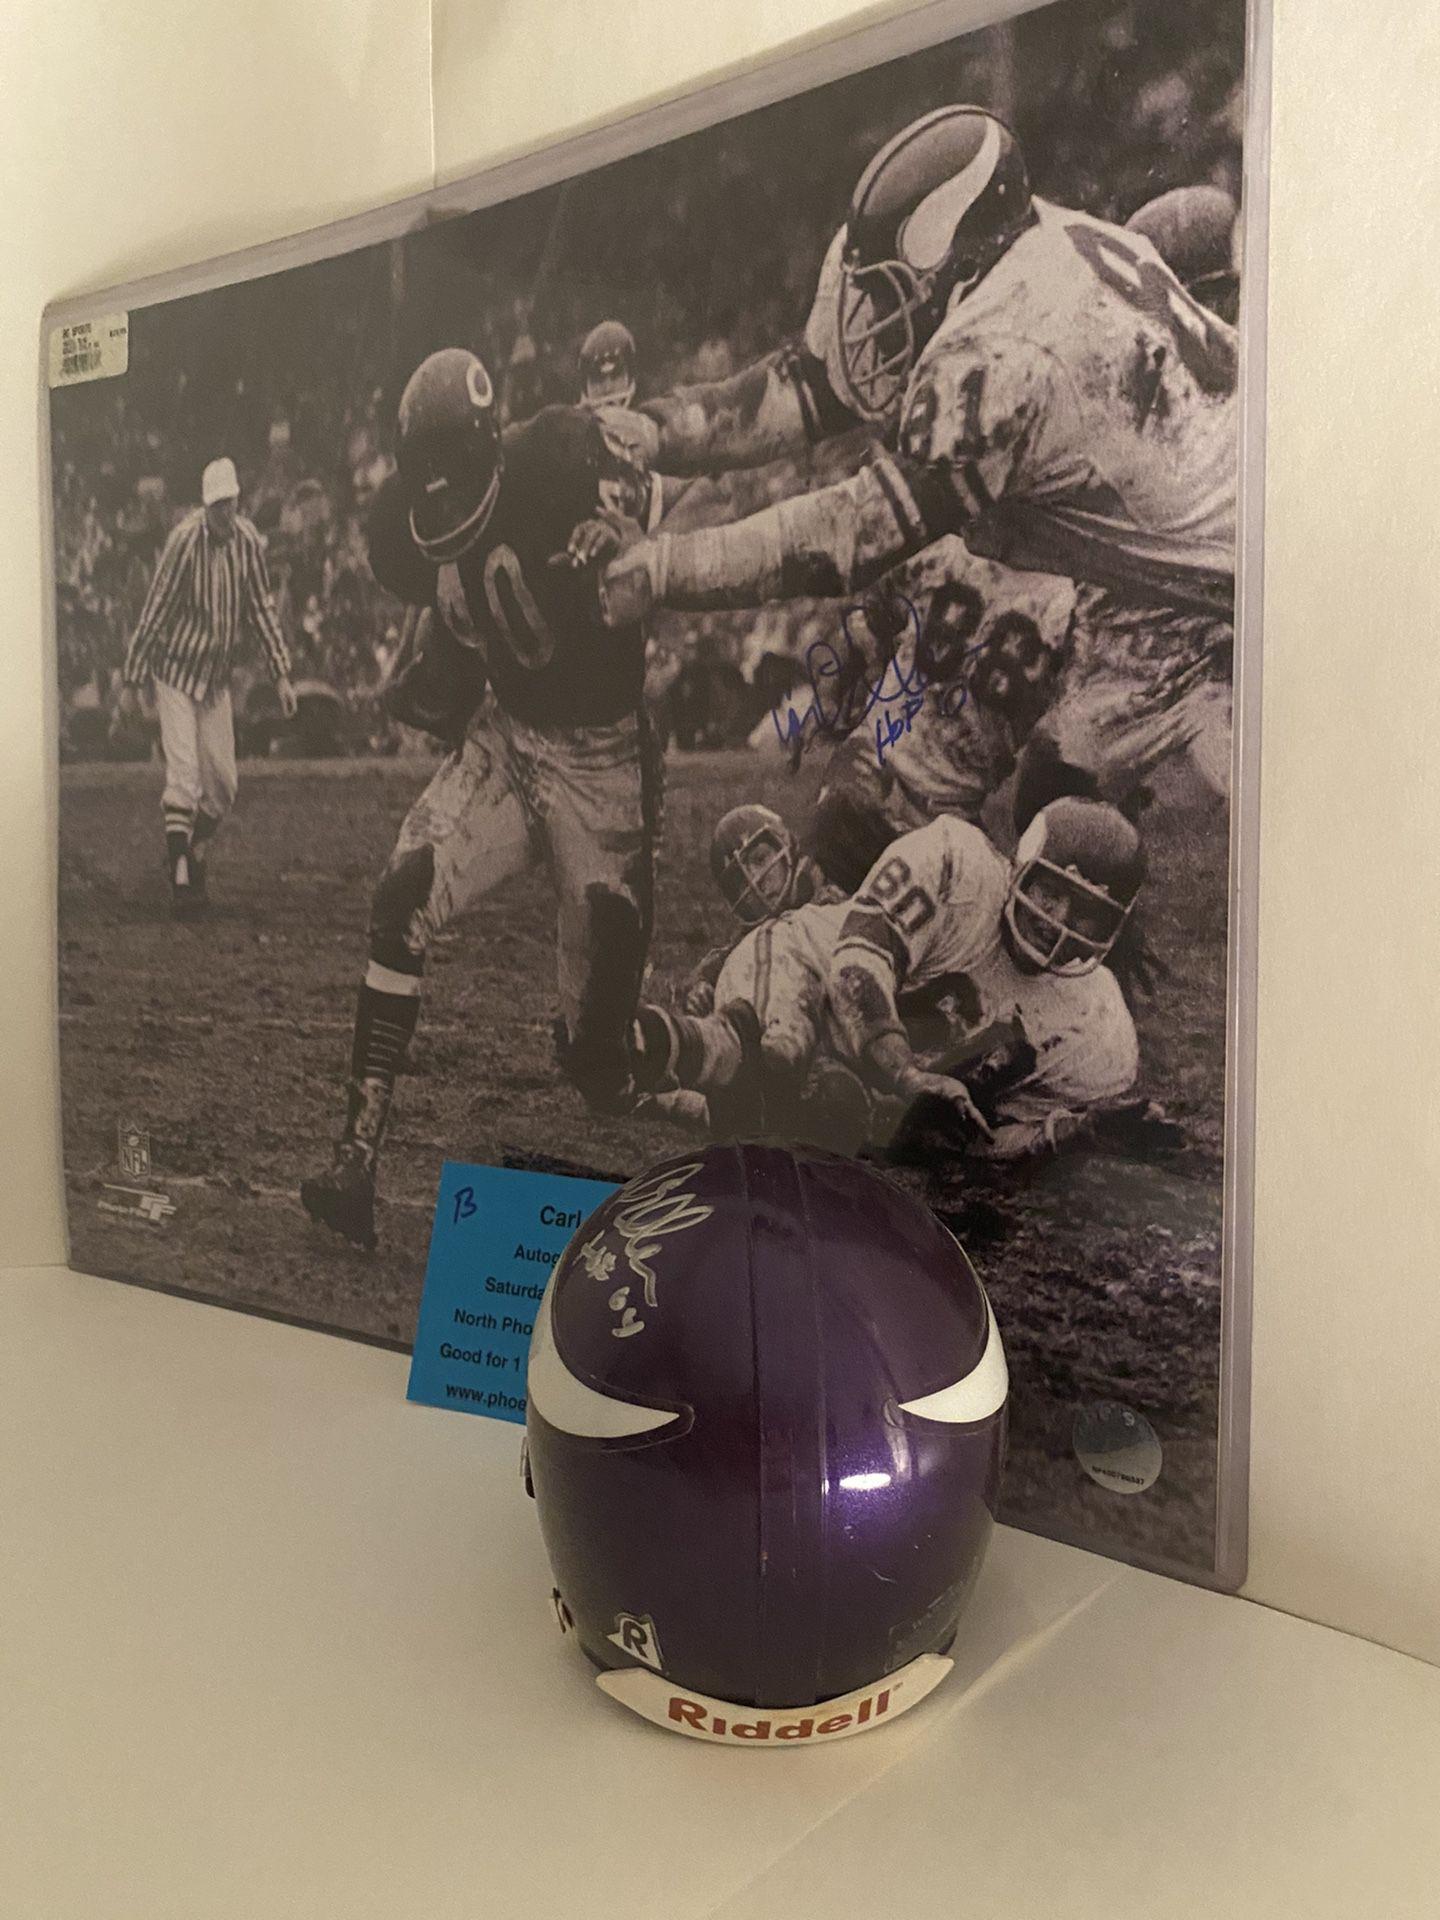 Carl Eller Minnesota Vikings Autographed Mini Helmet w Inscrip / Cert of Auth WOW !!